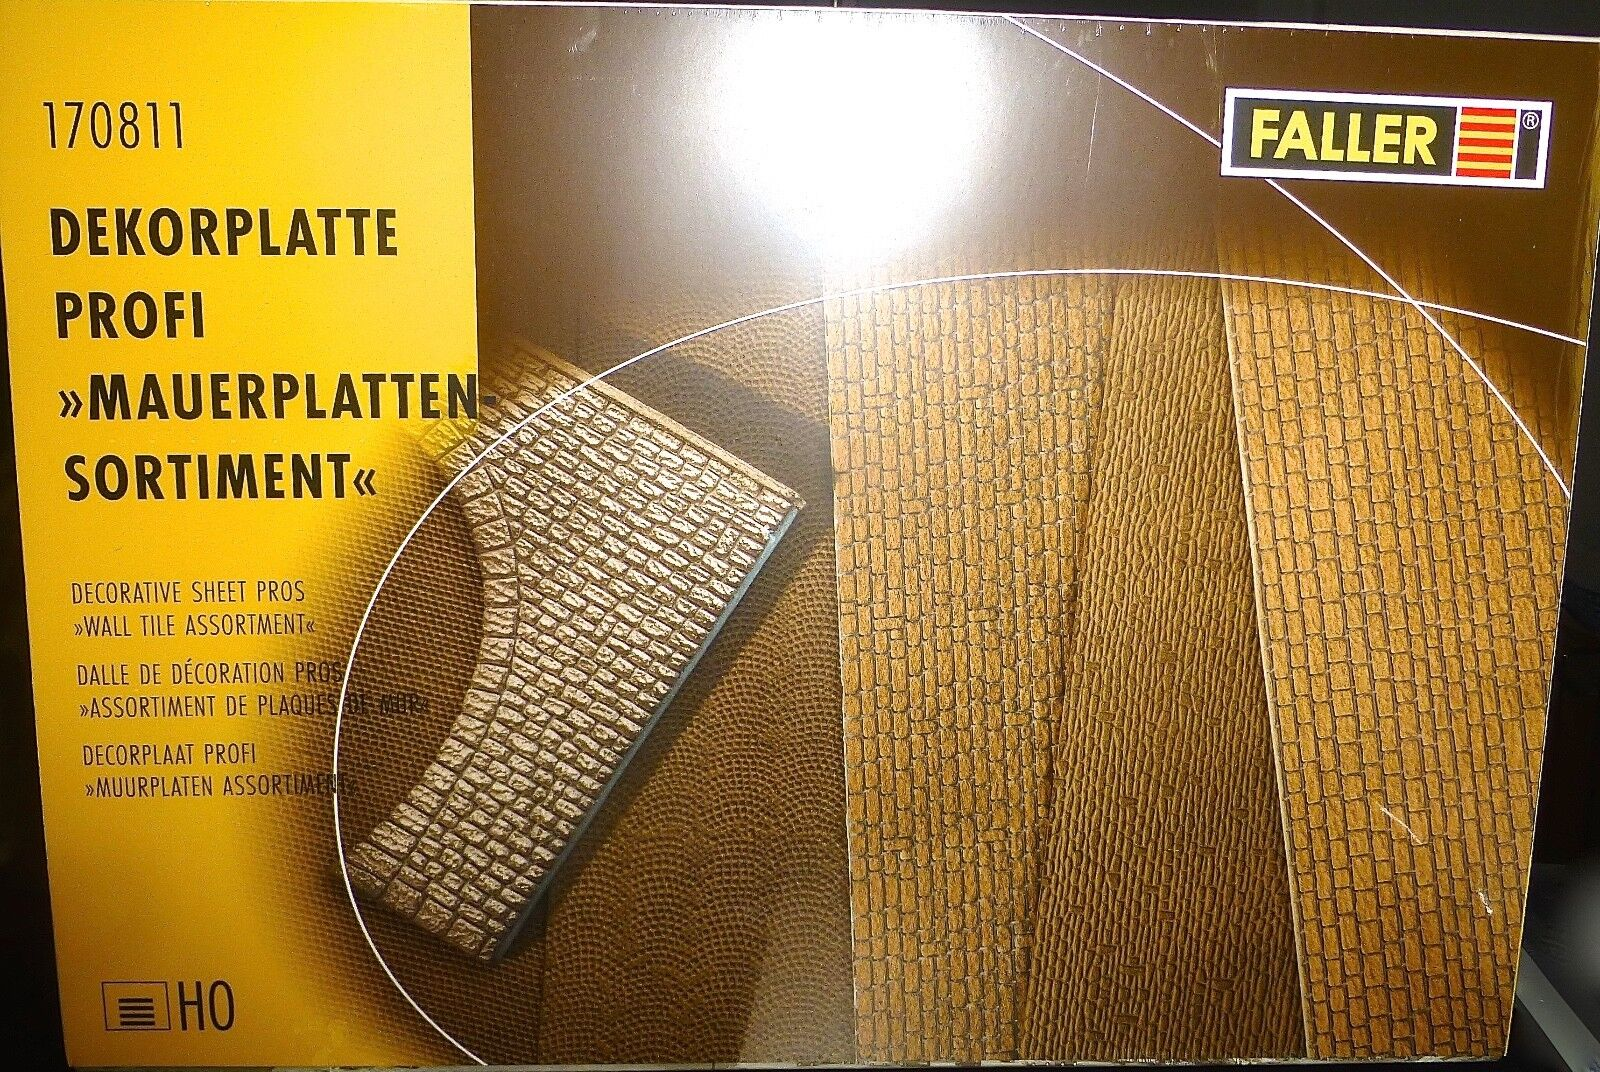 Wall Plates Assortment Decorative 370x200x2 mm Faller 170811 H0 1 87 orig.